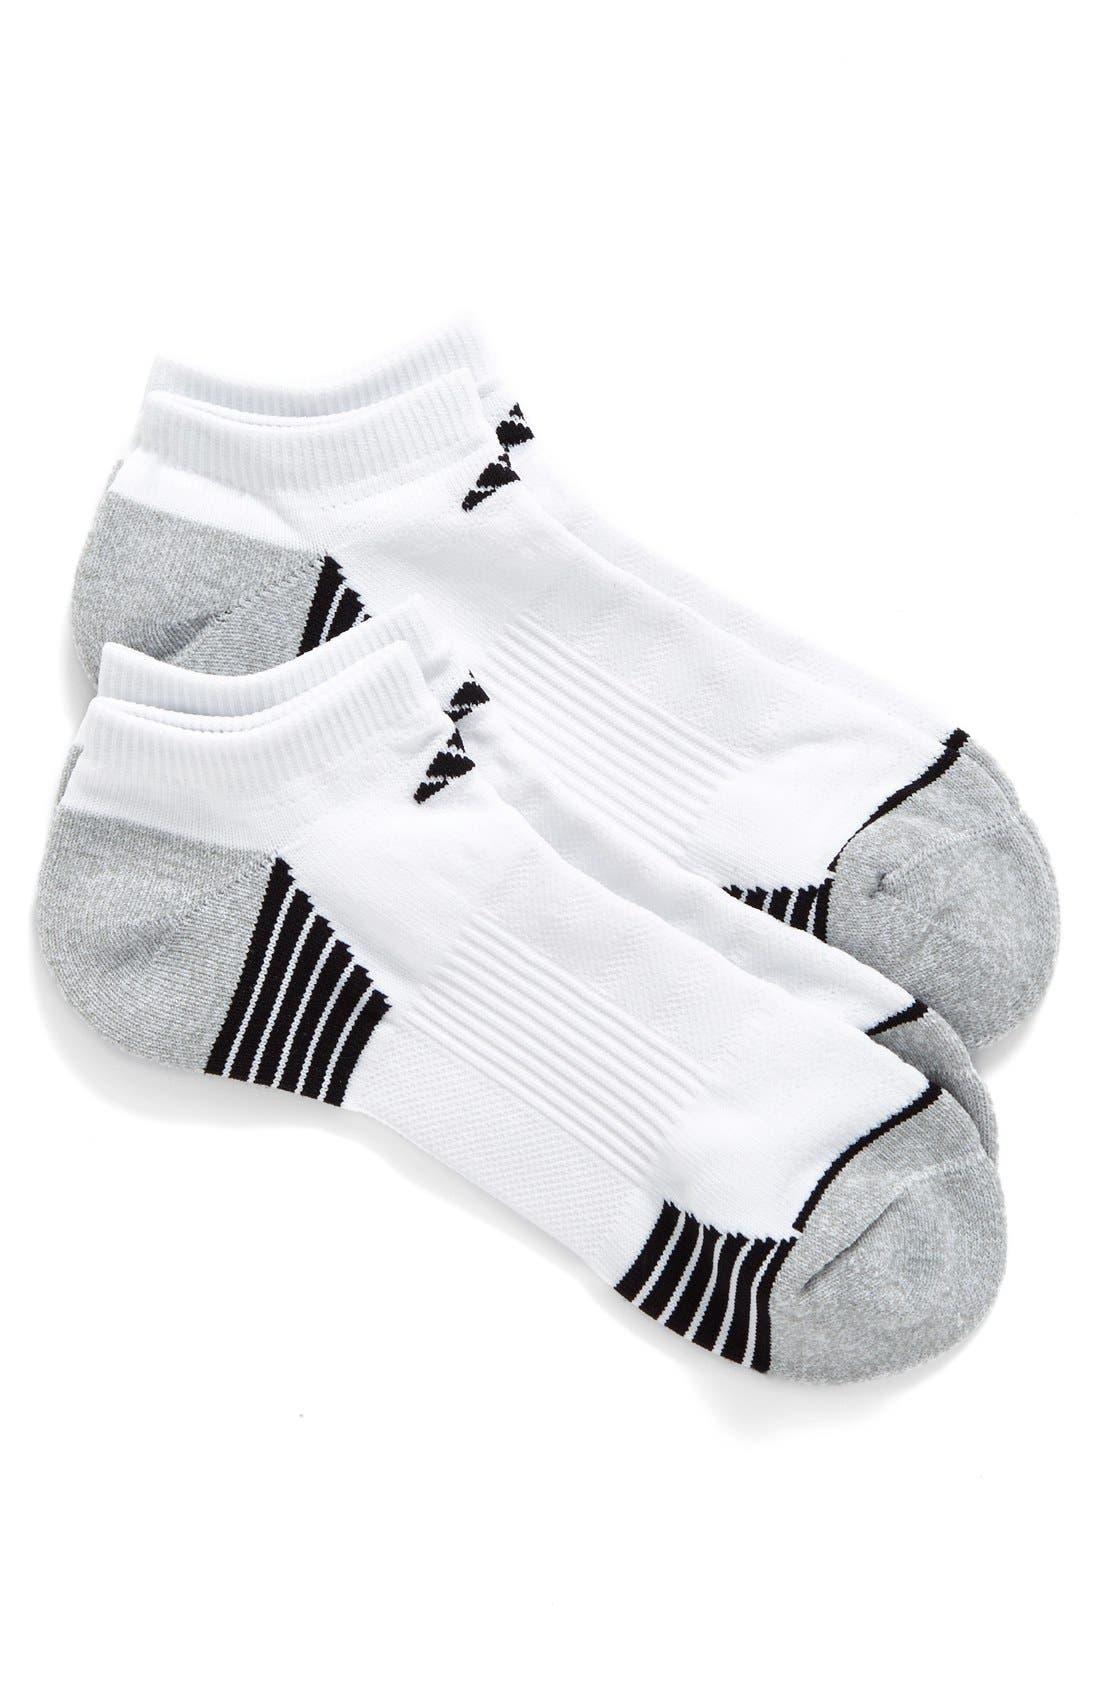 Main Image - adidas 2-Pack Superlite Speed No-Show Socks